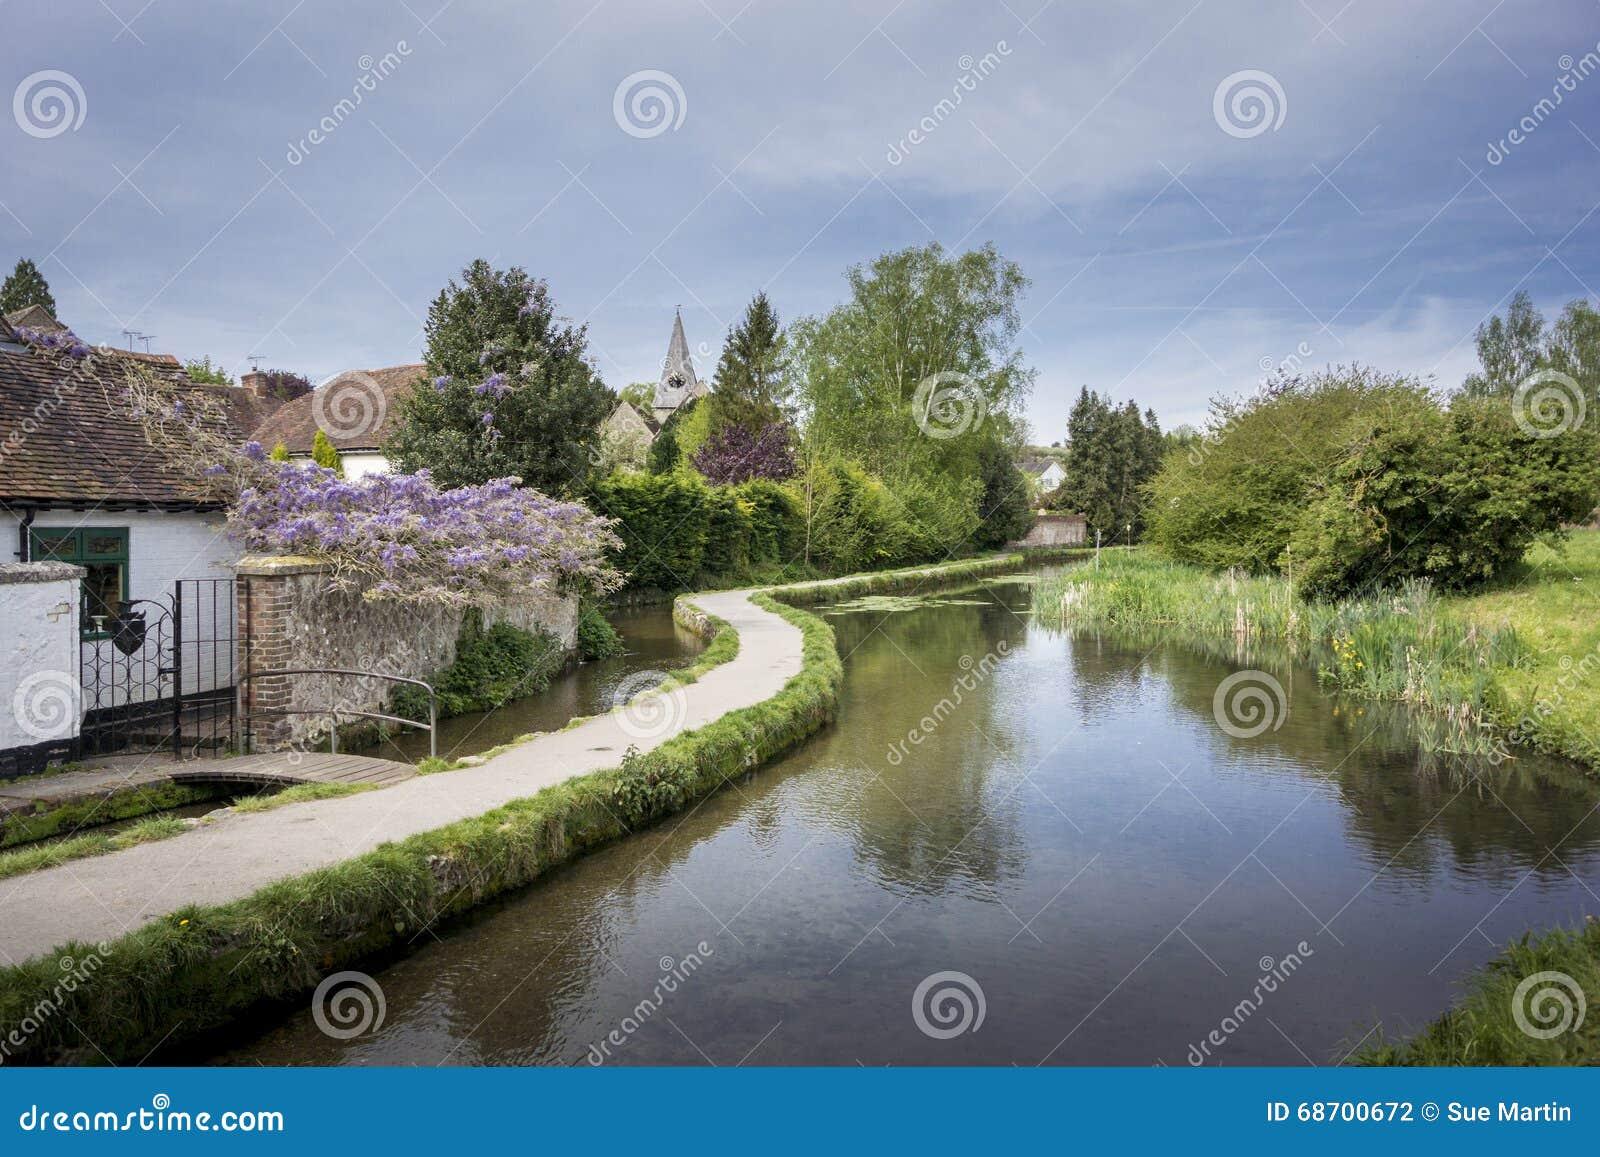 Vila fraca, Kent, Reino Unido